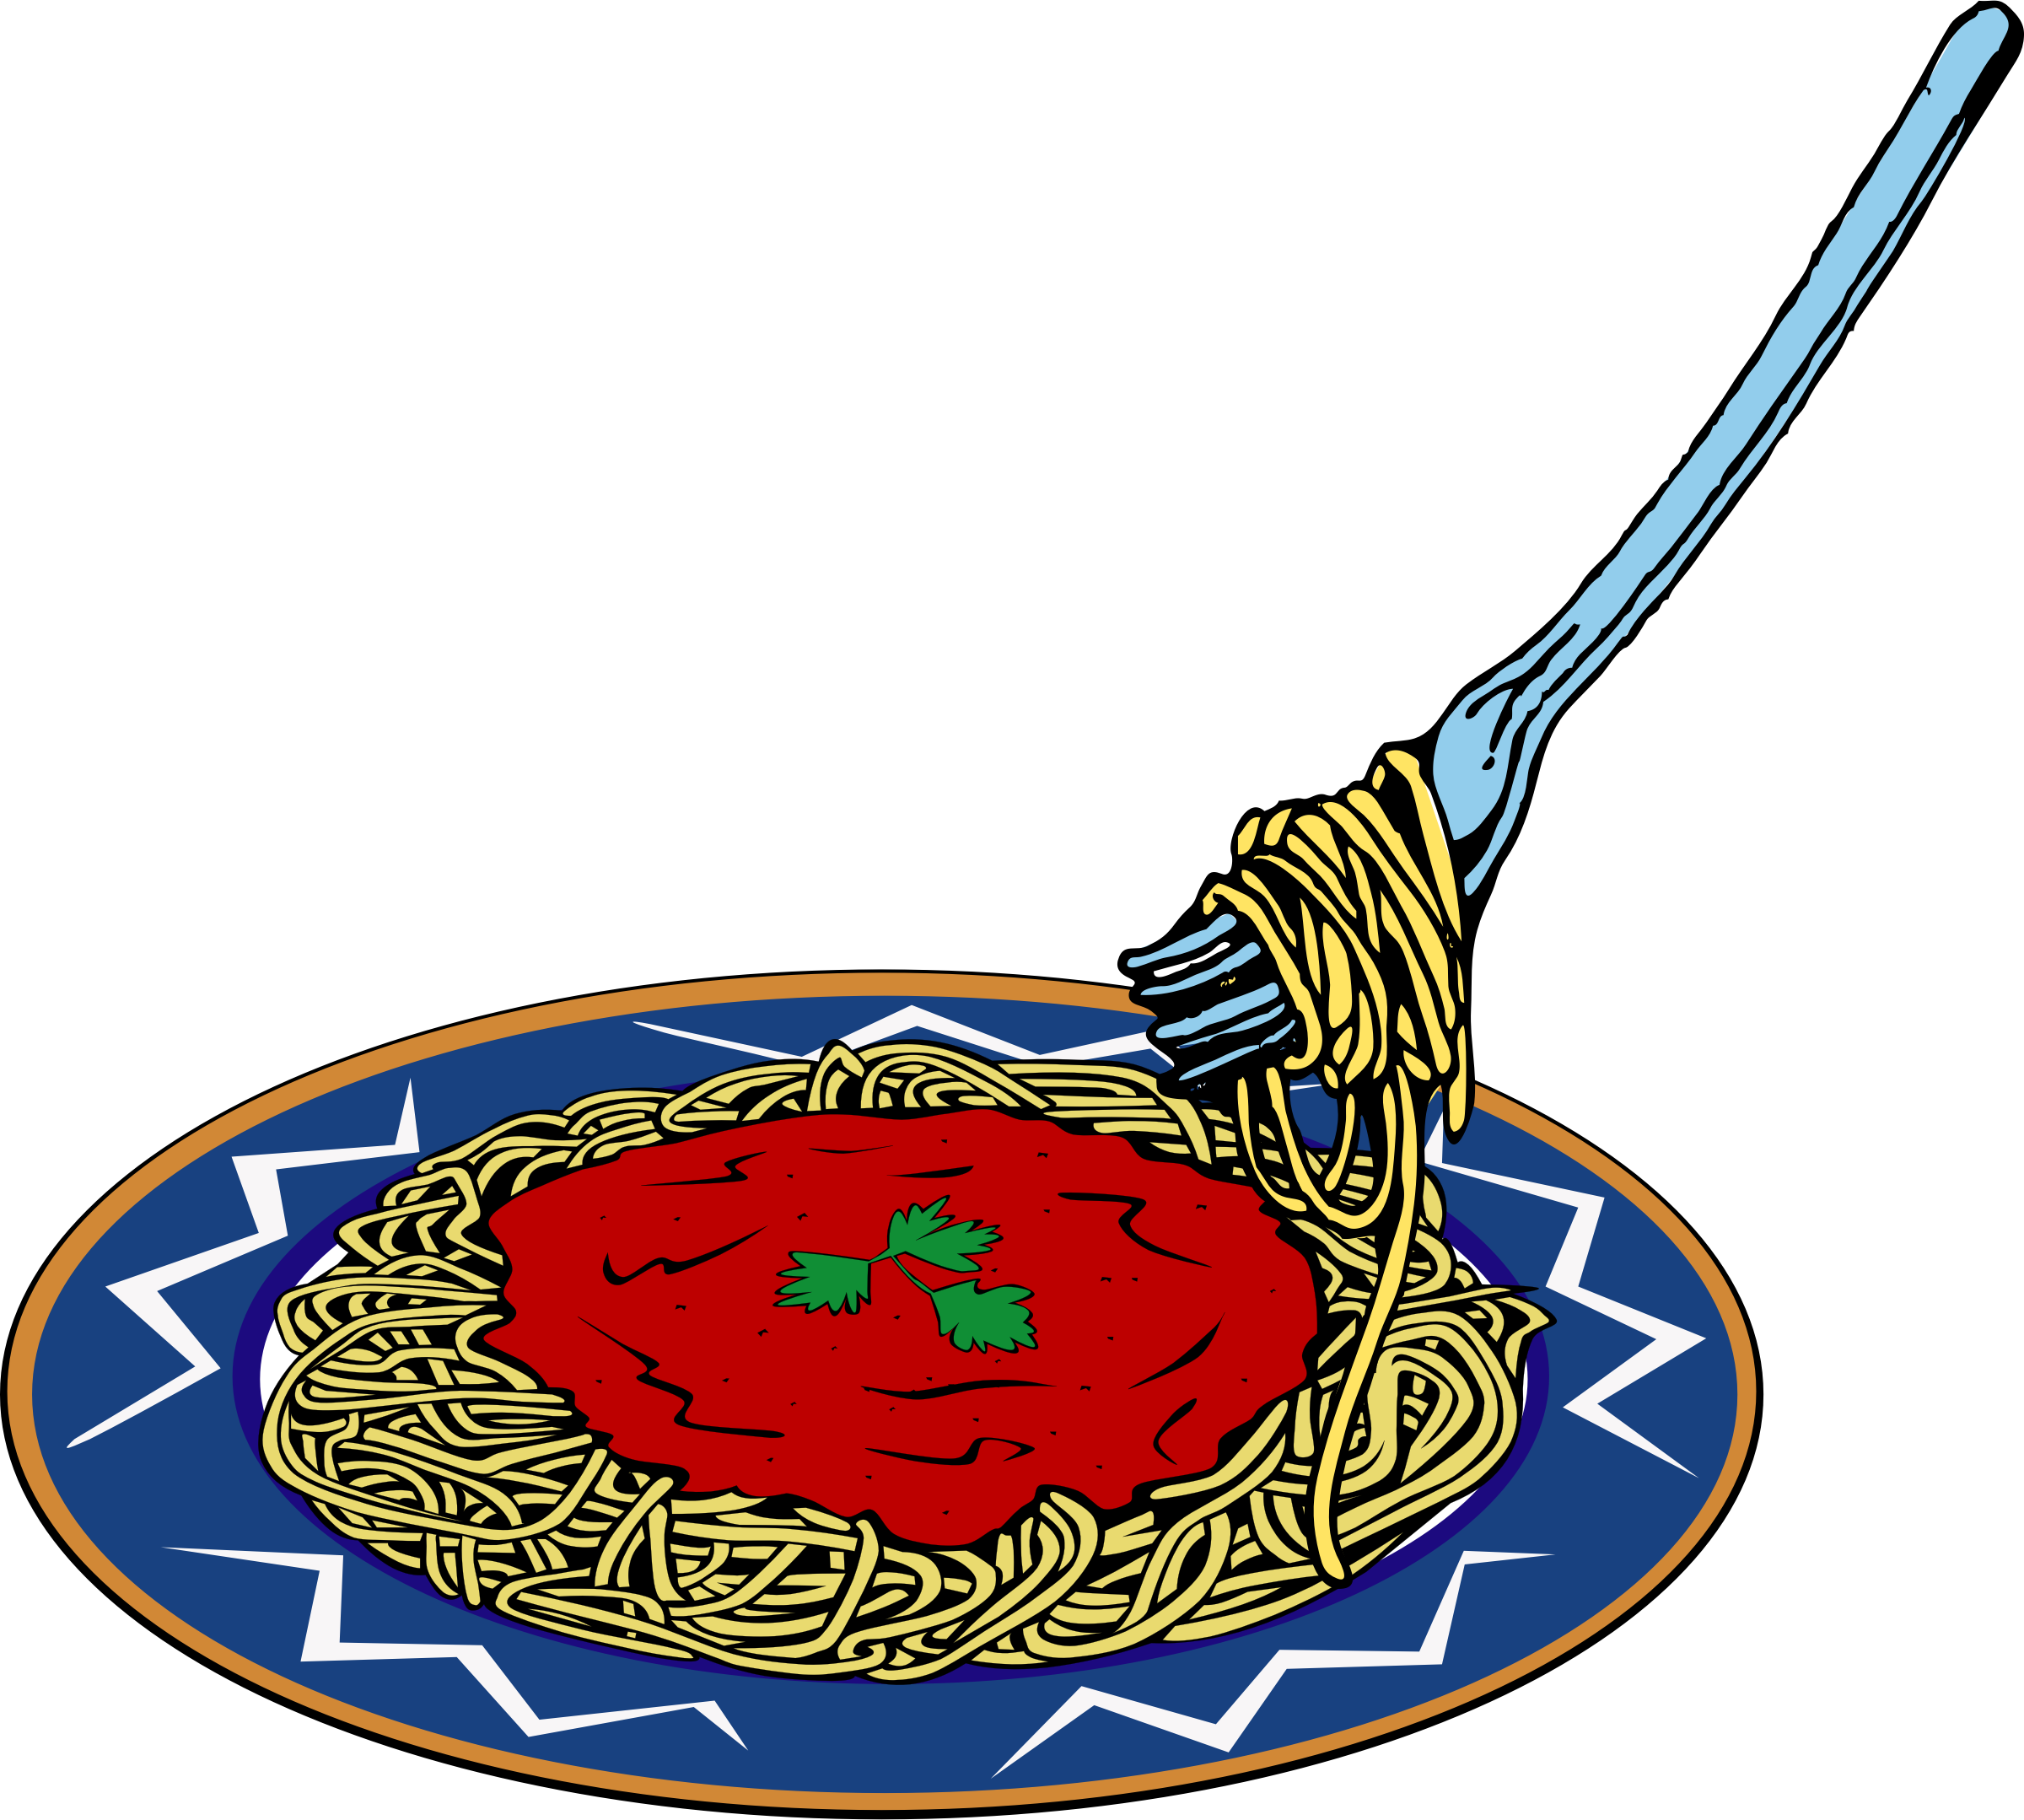 Spaghetti clipart 3